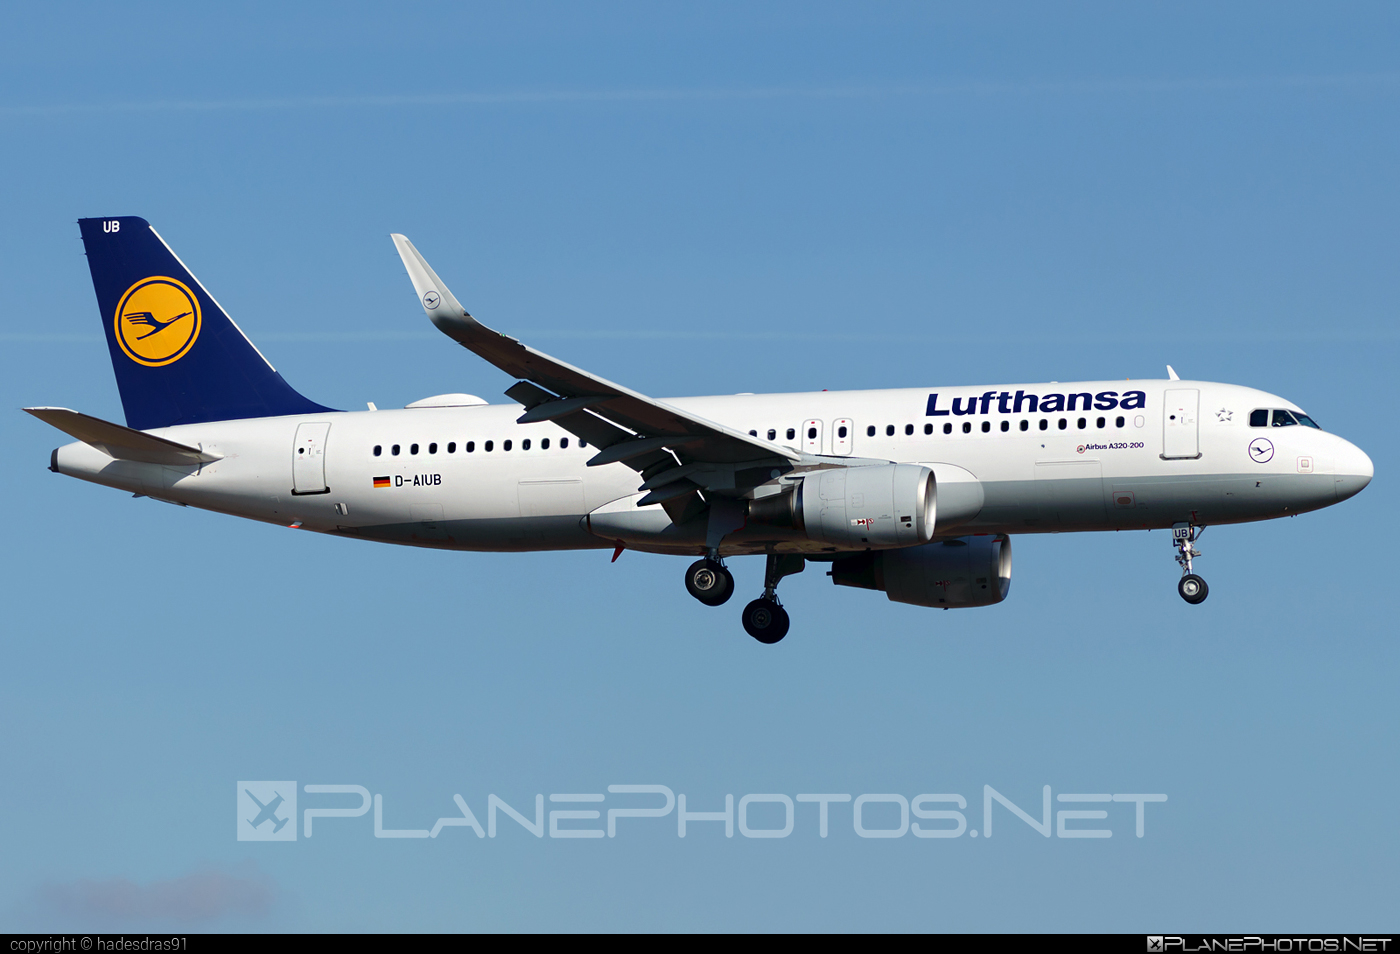 Airbus A320-214 - D-AIUB operated by Lufthansa #a320 #a320family #airbus #airbus320 #lufthansa